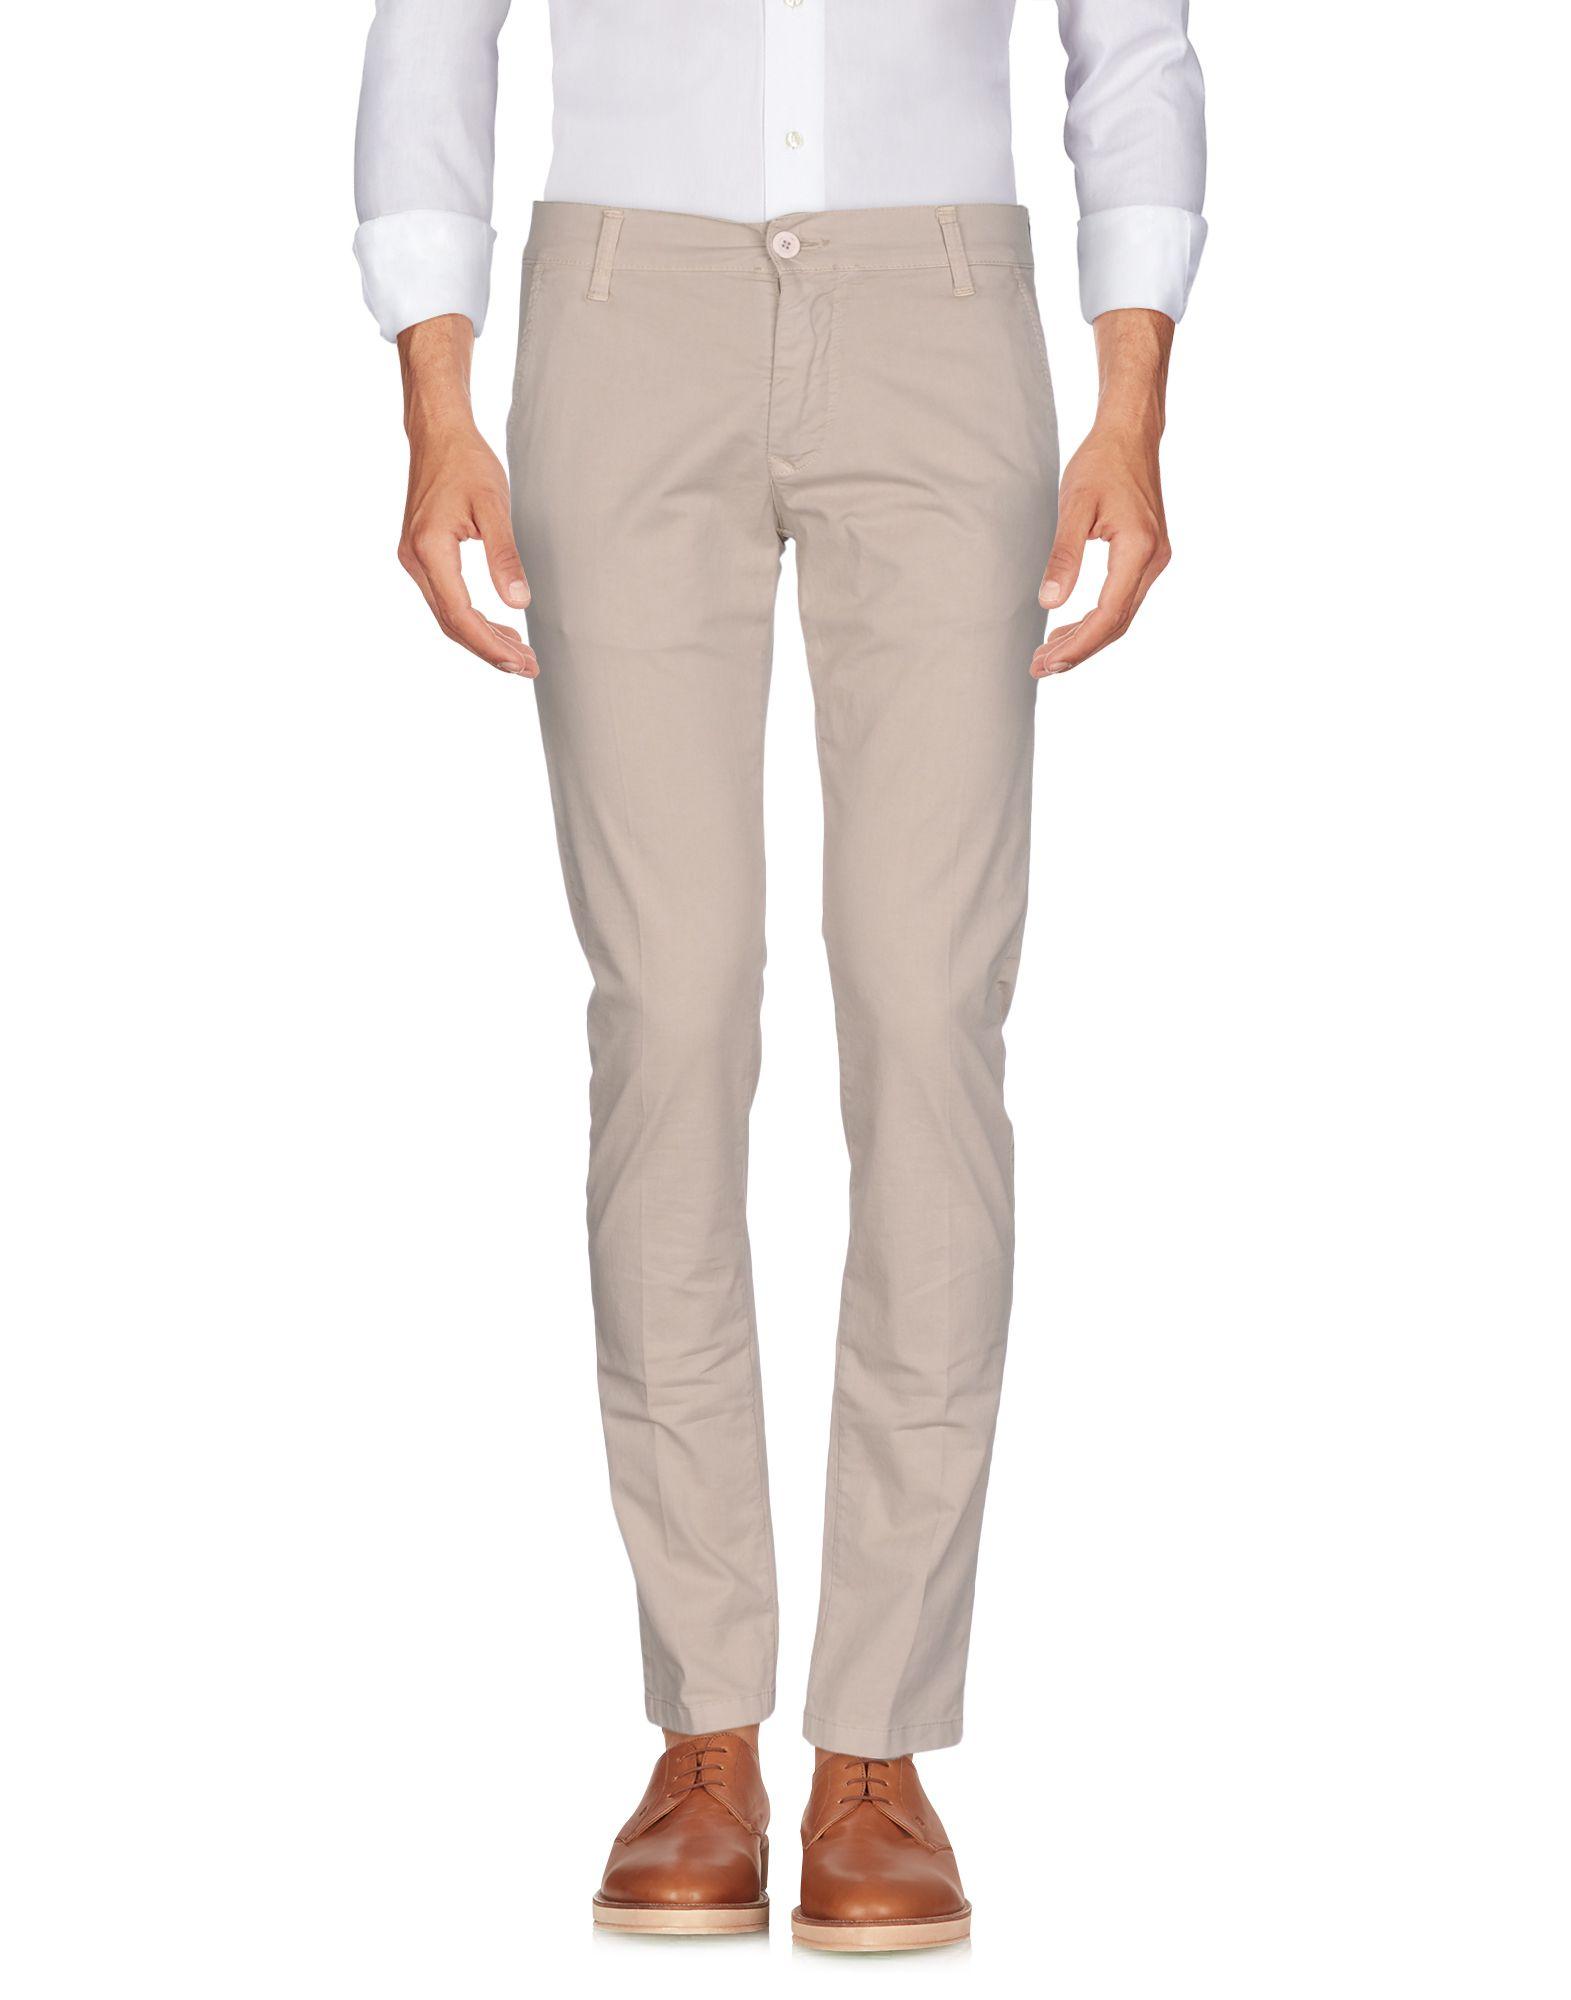 OUTFIT Повседневные брюки random 10 items   fashion 5 outfit   5